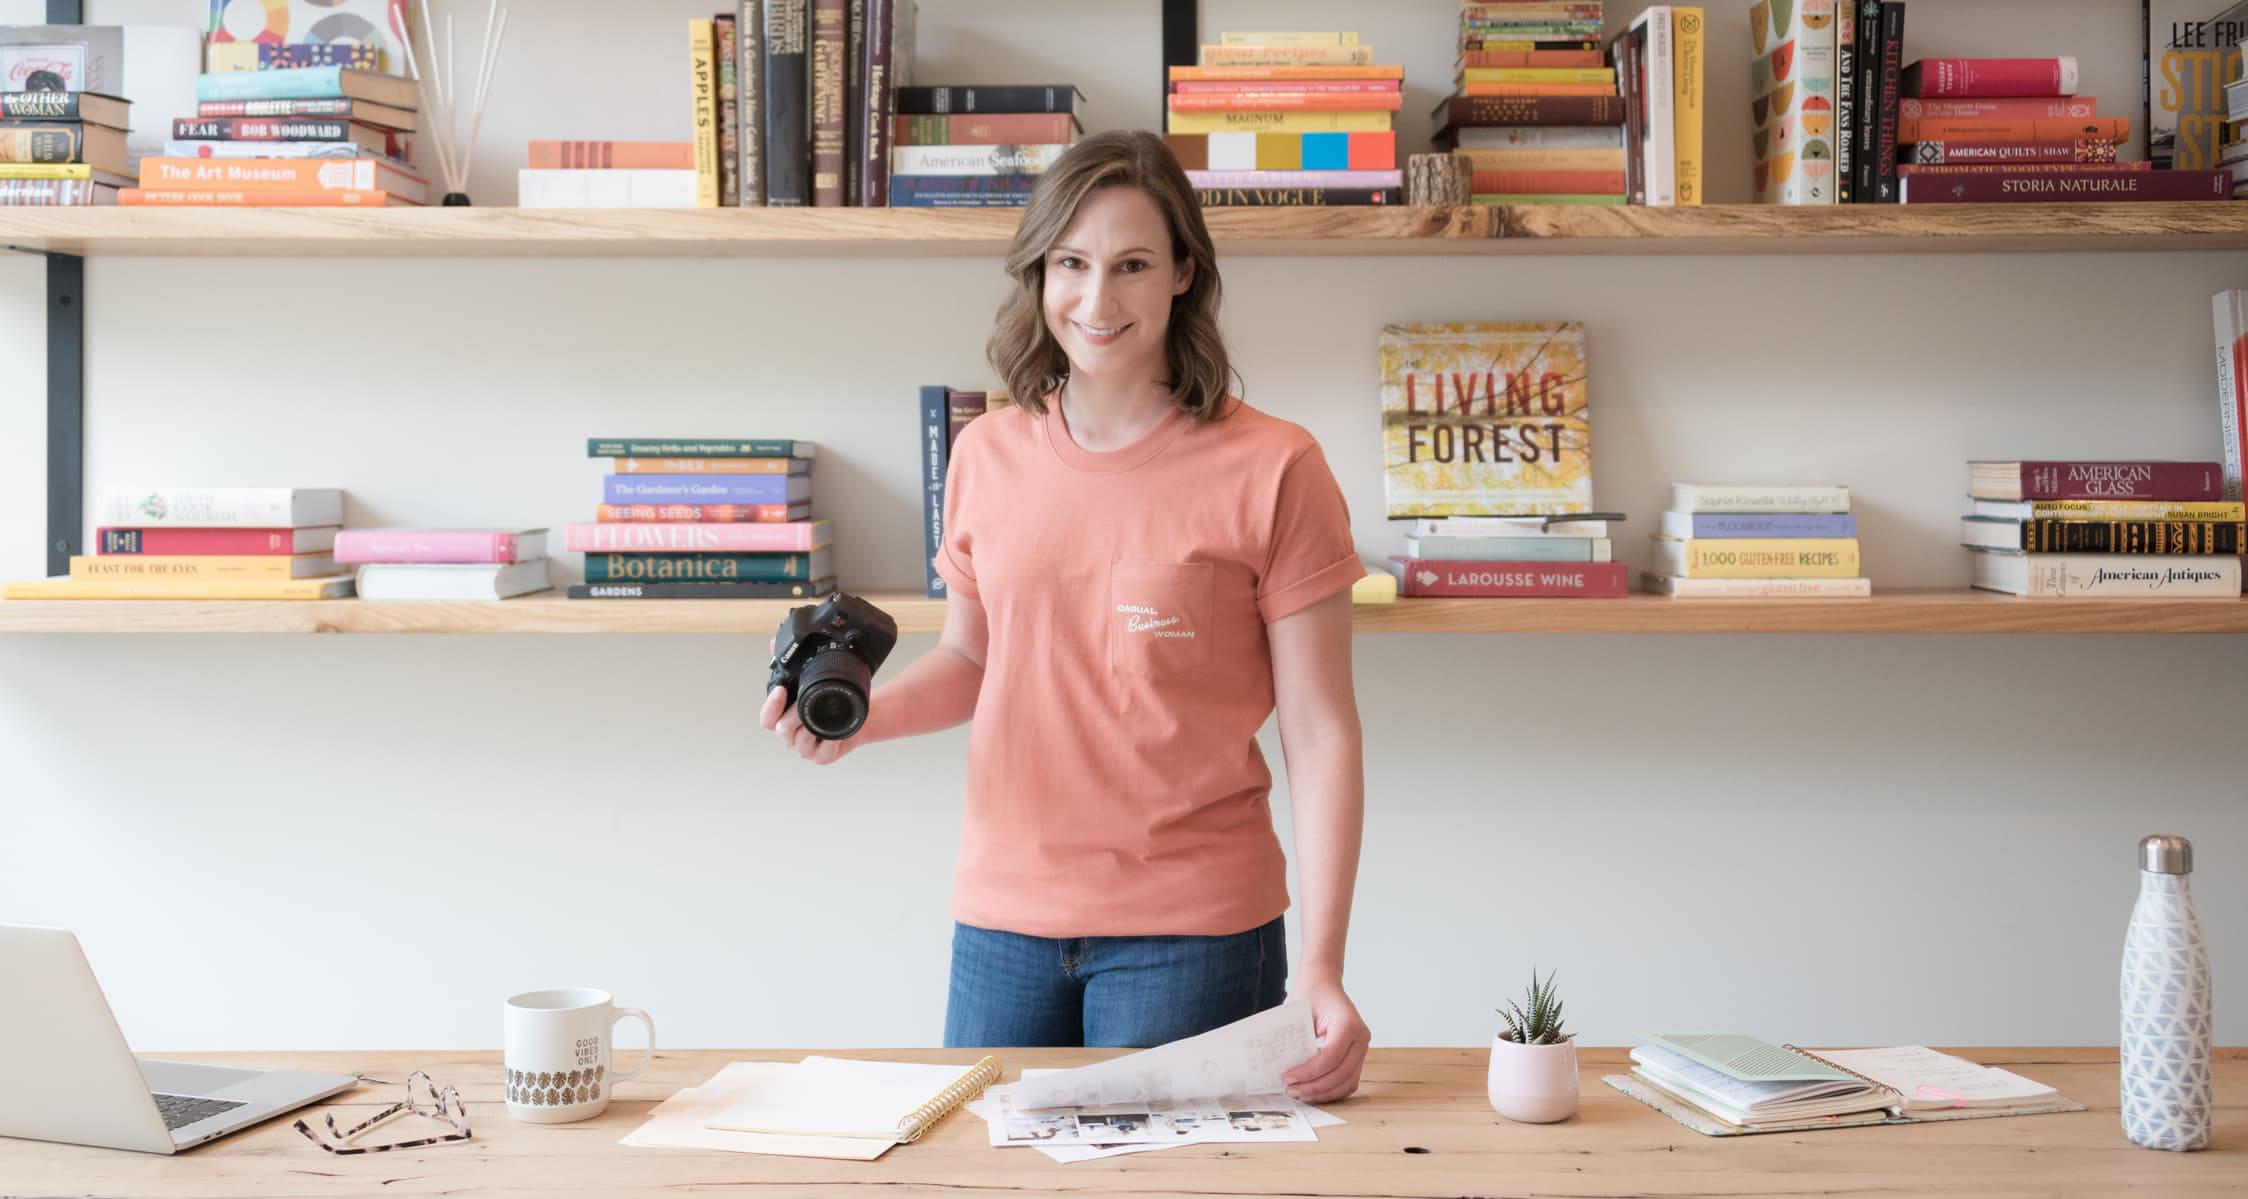 Danielle Hunter & Hunter Design Studio work, including branding, website design, and product photography